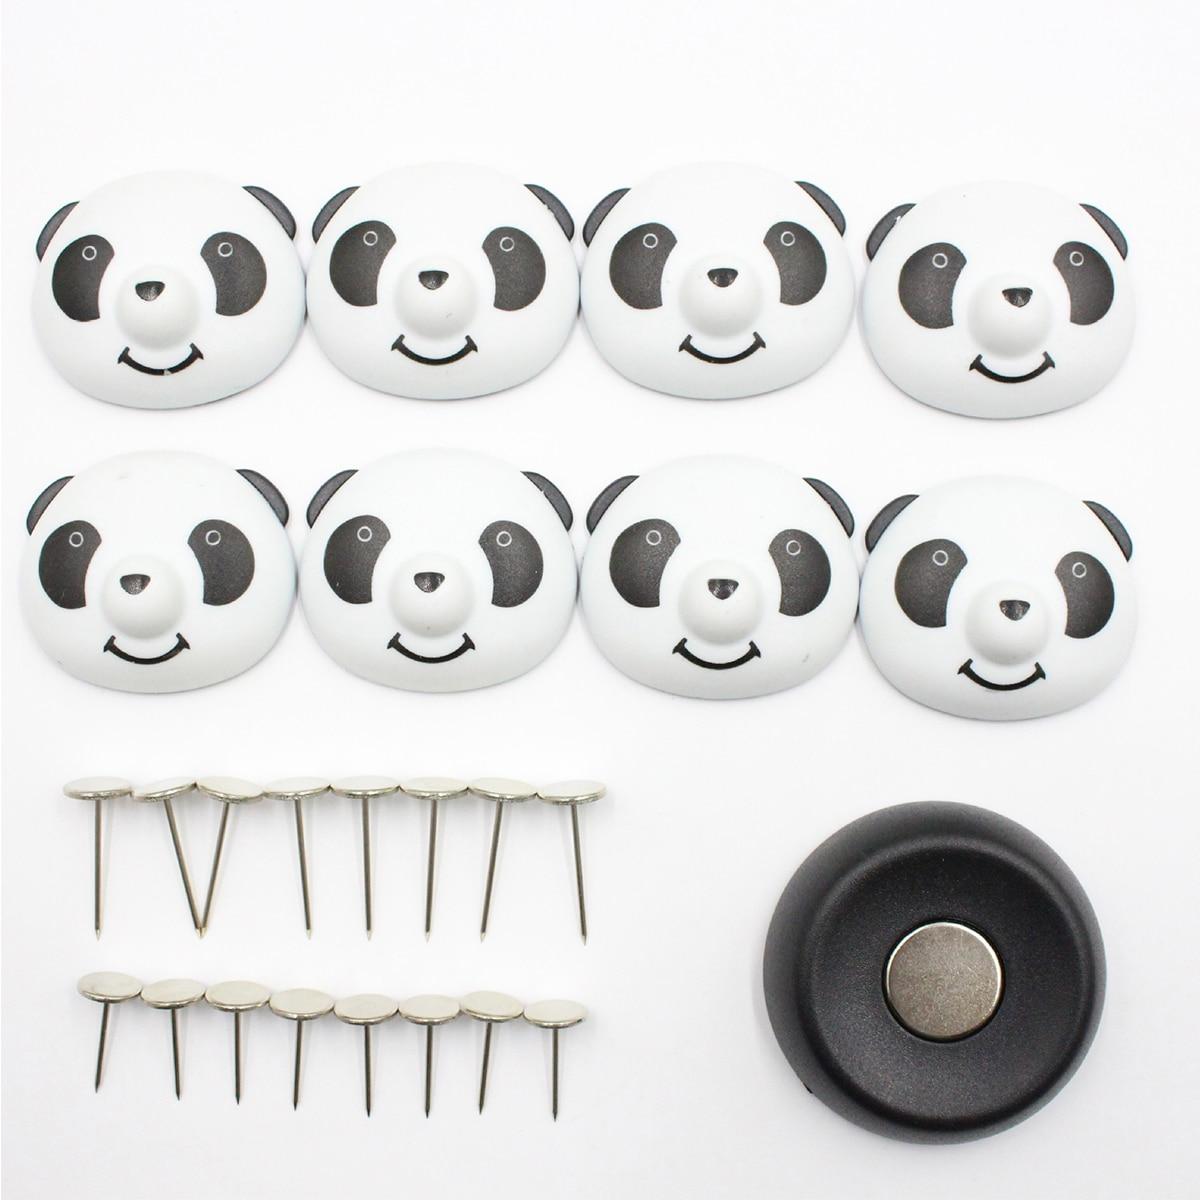 8 Uds pinza para edredón Panda con 16 Pines, fijador de sábanas antideslizante, cubierta de edredón, pinzas magnéticas Anti-movimiento para ropa